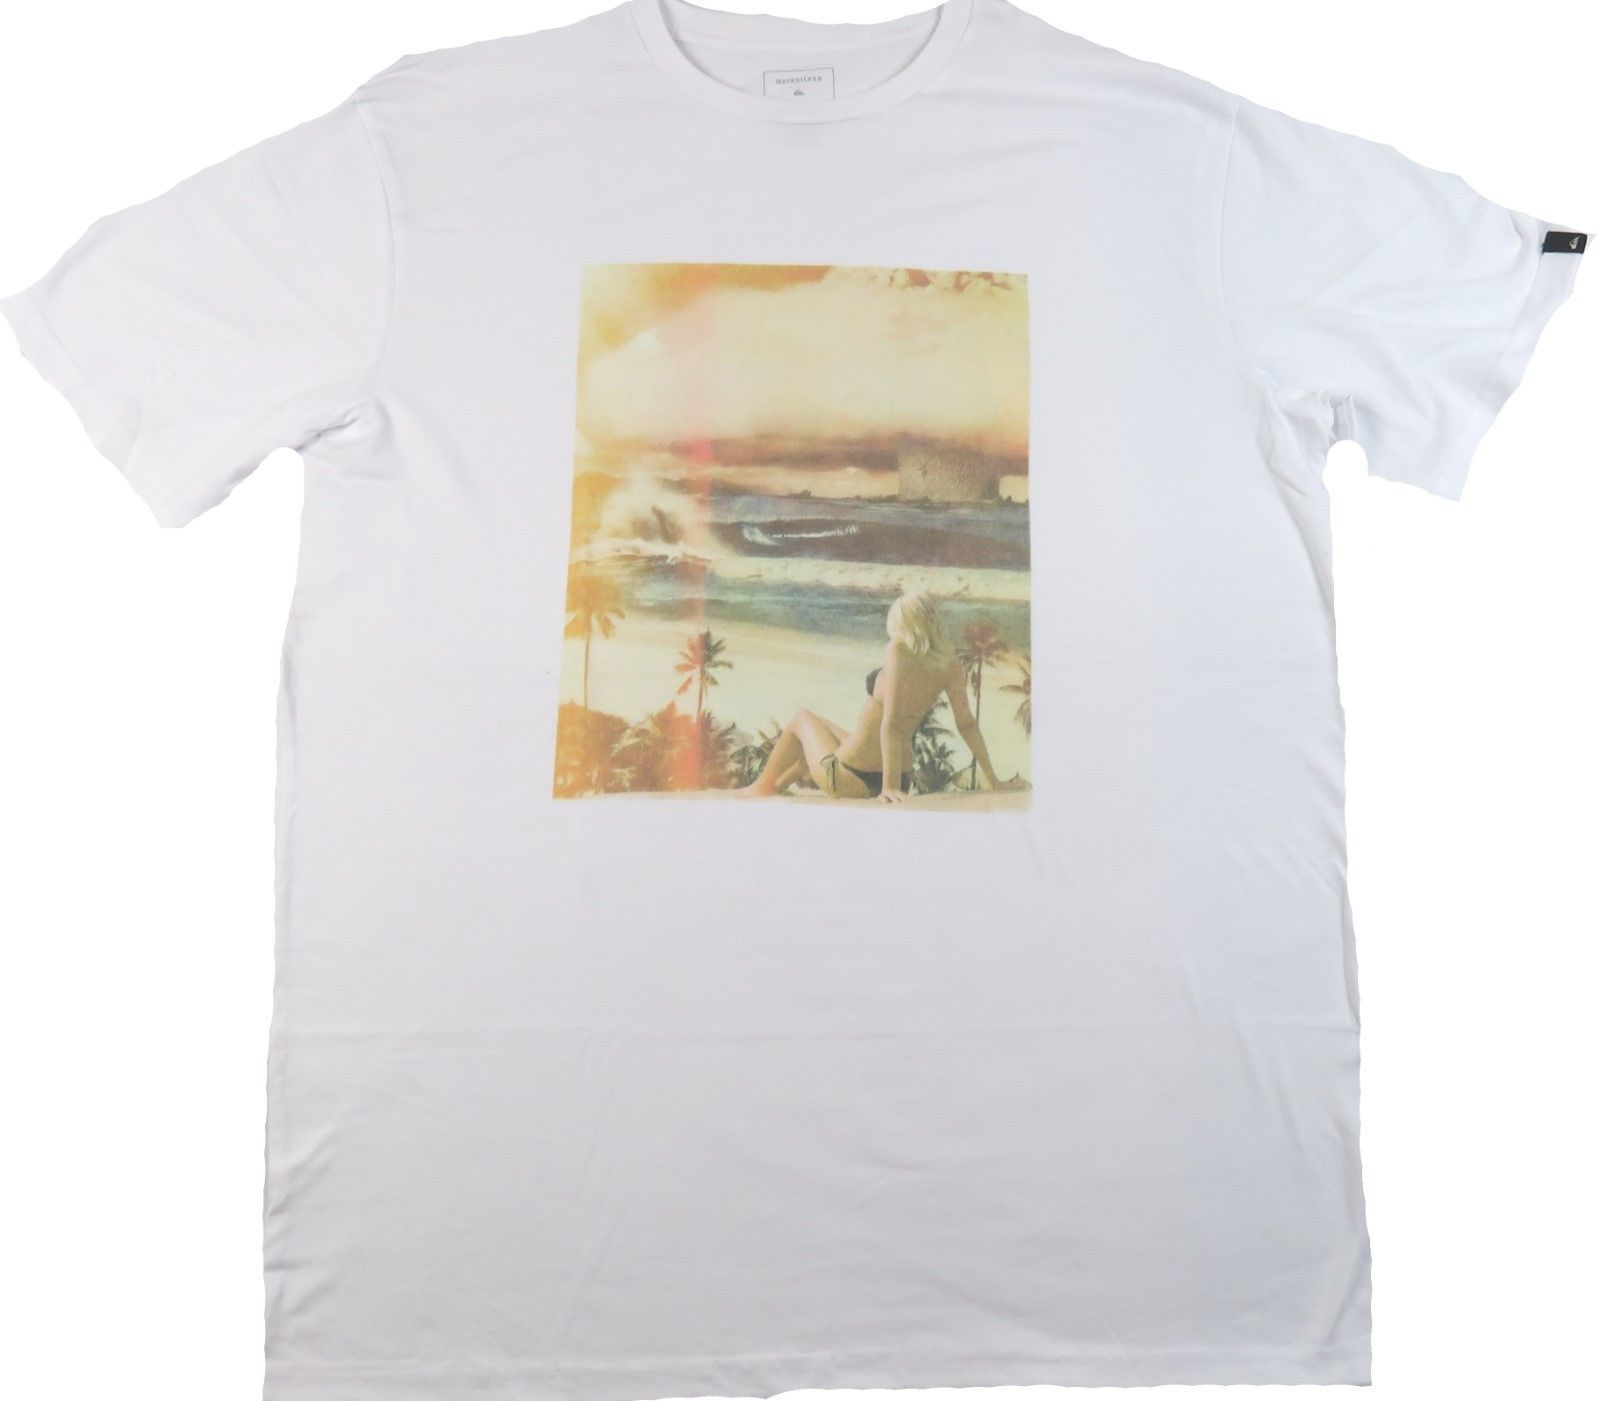 XL Quiksilver Men's Tee Shirt Surfing Beach Casual White Photograph T-Shirt